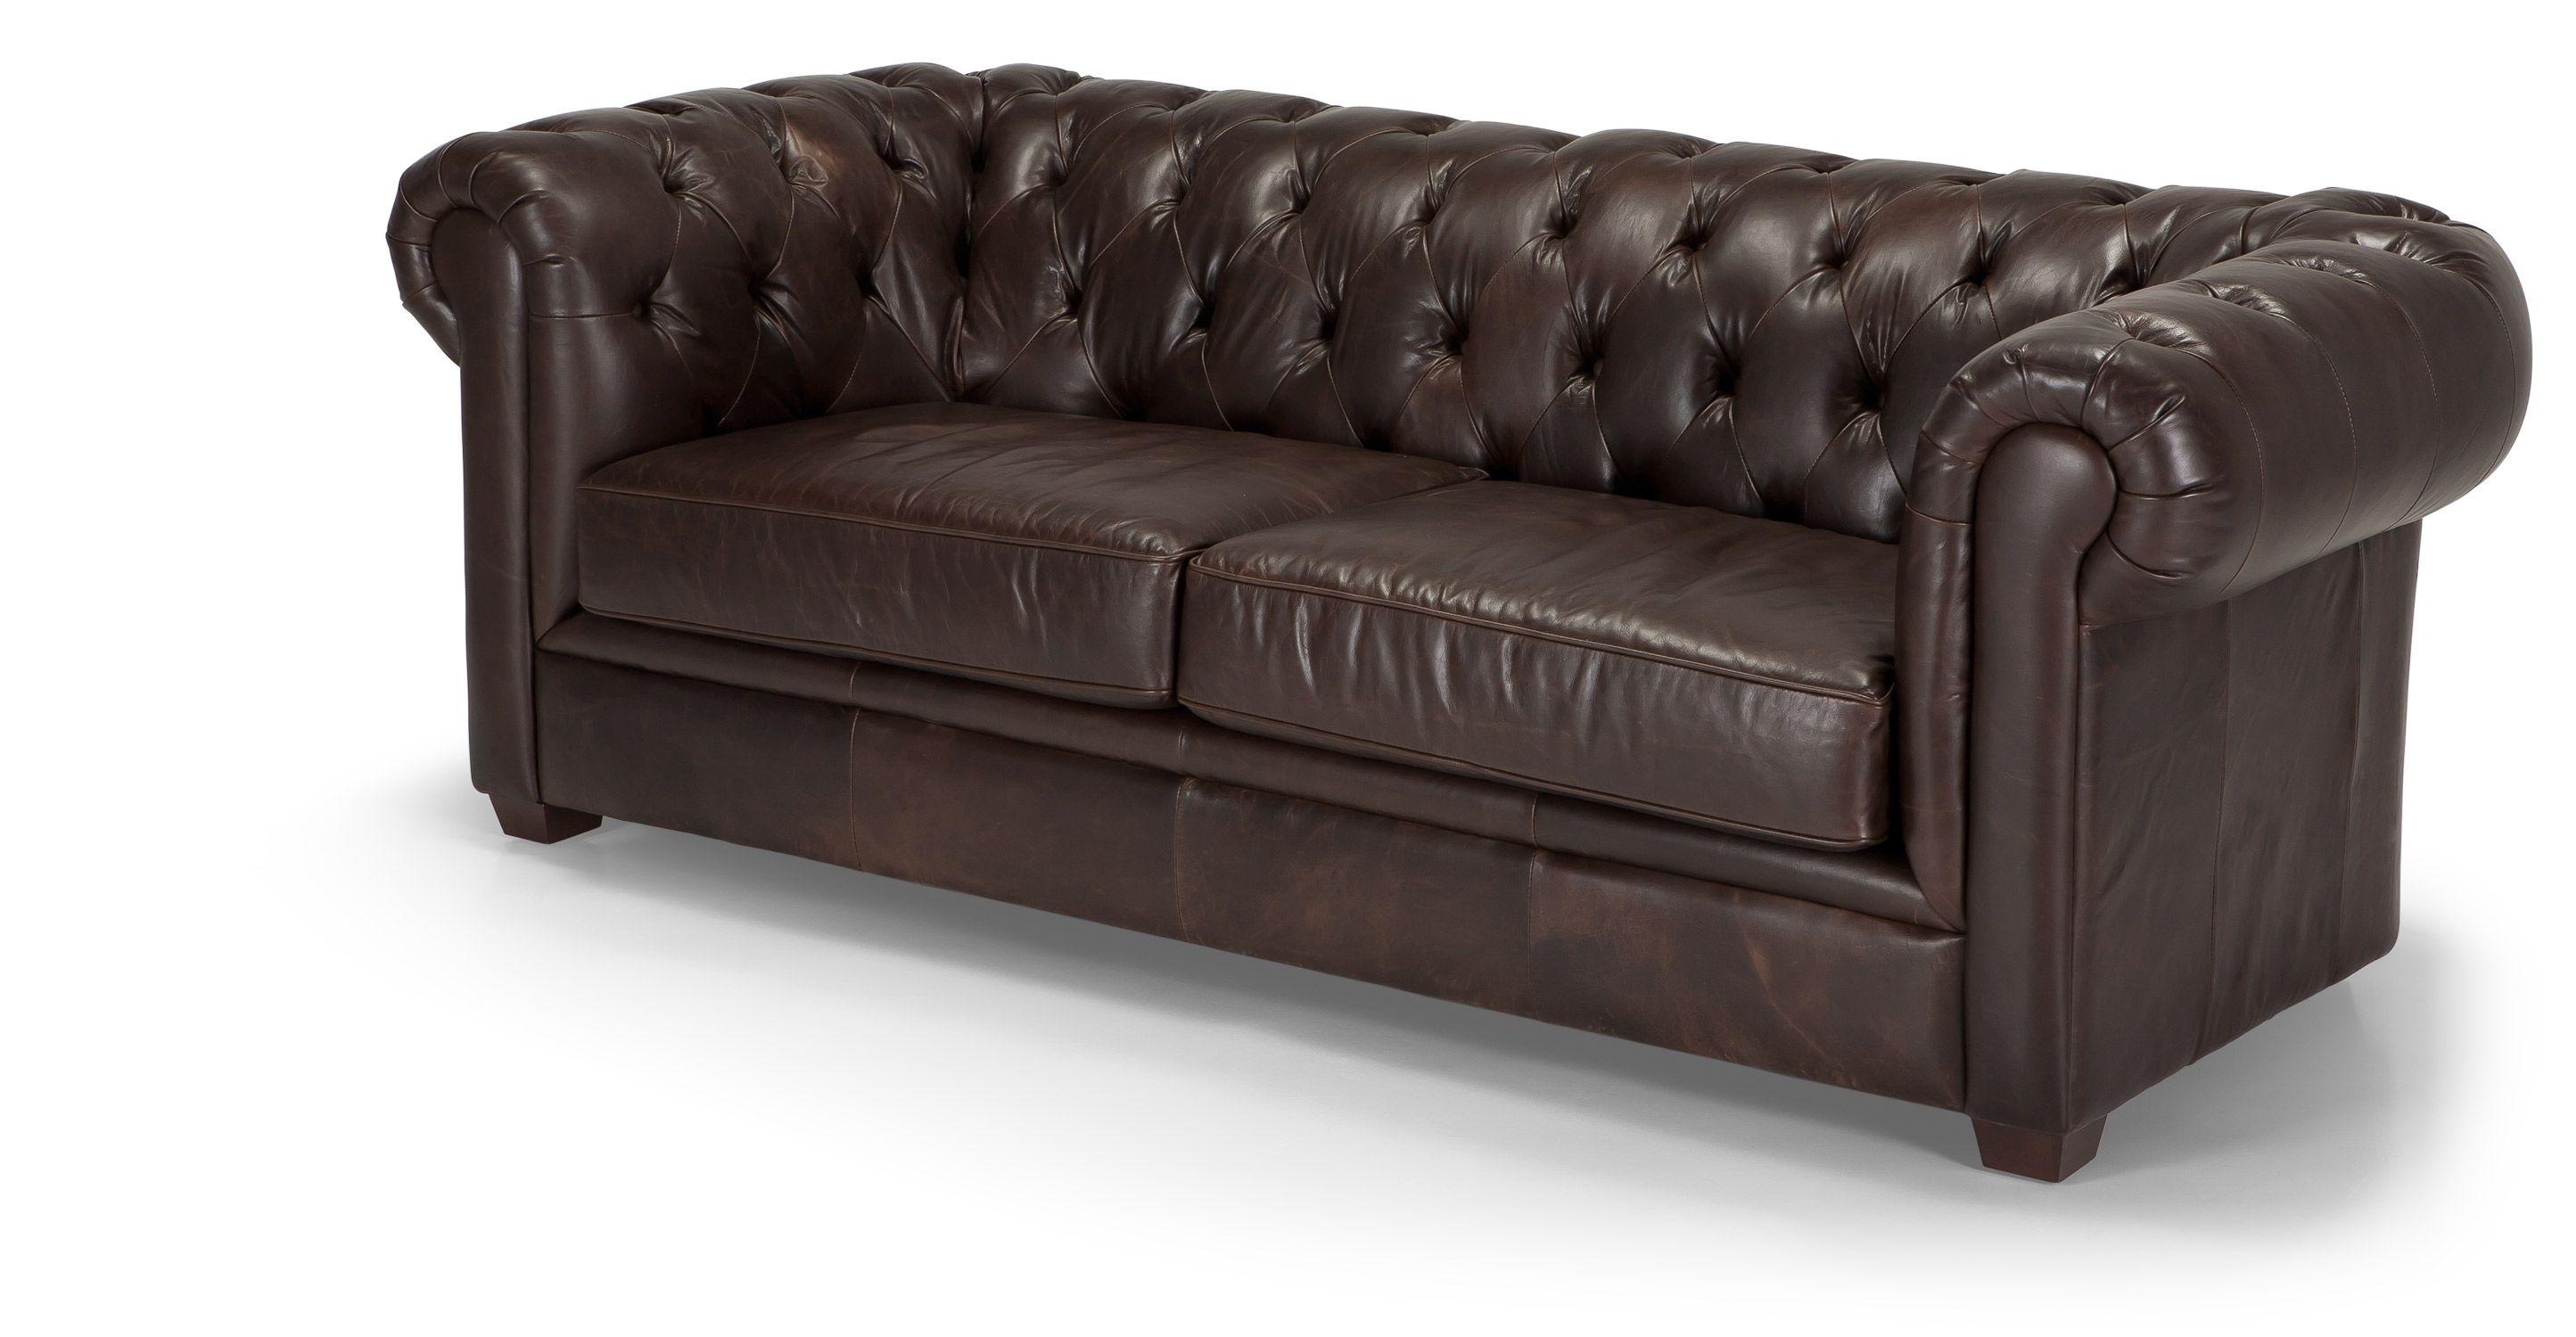 Mayson Chesterfield 3 Seater Sofa, Antique Brown Premium